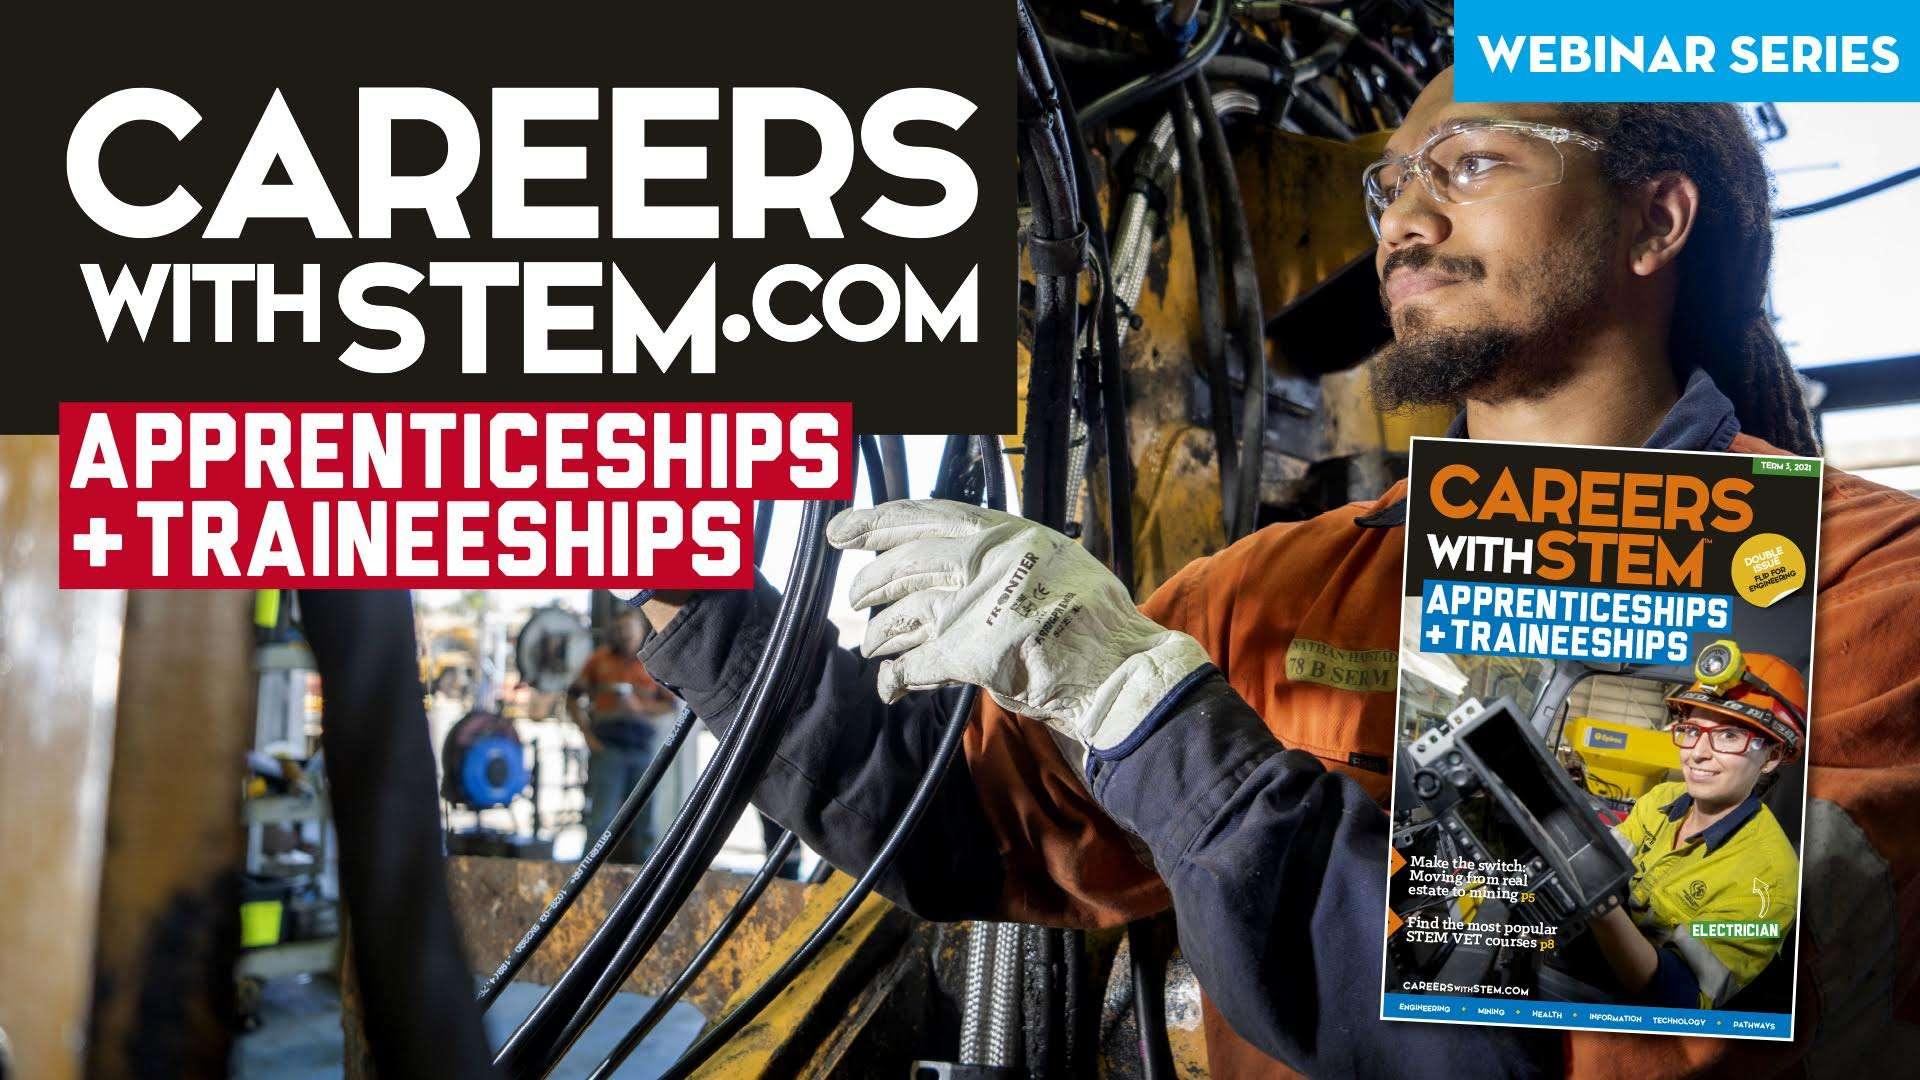 Apprenticeships & Traineeships Webinar